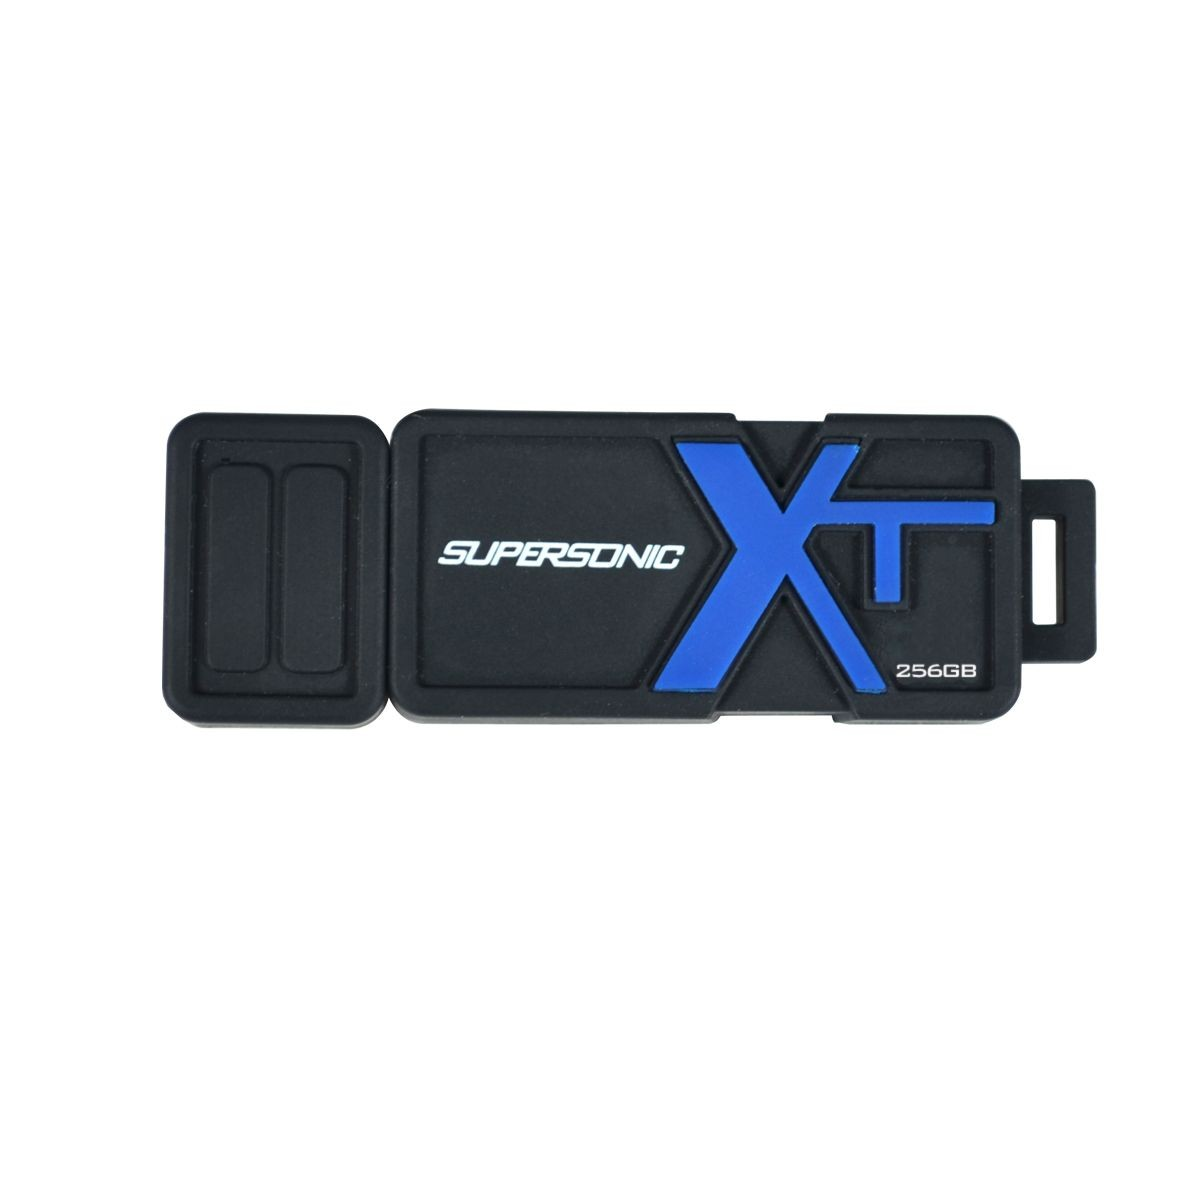 Patriot pamięć USB 256GB Supersonic XT Boost USB 3.0 (transfer do 150MB/s)